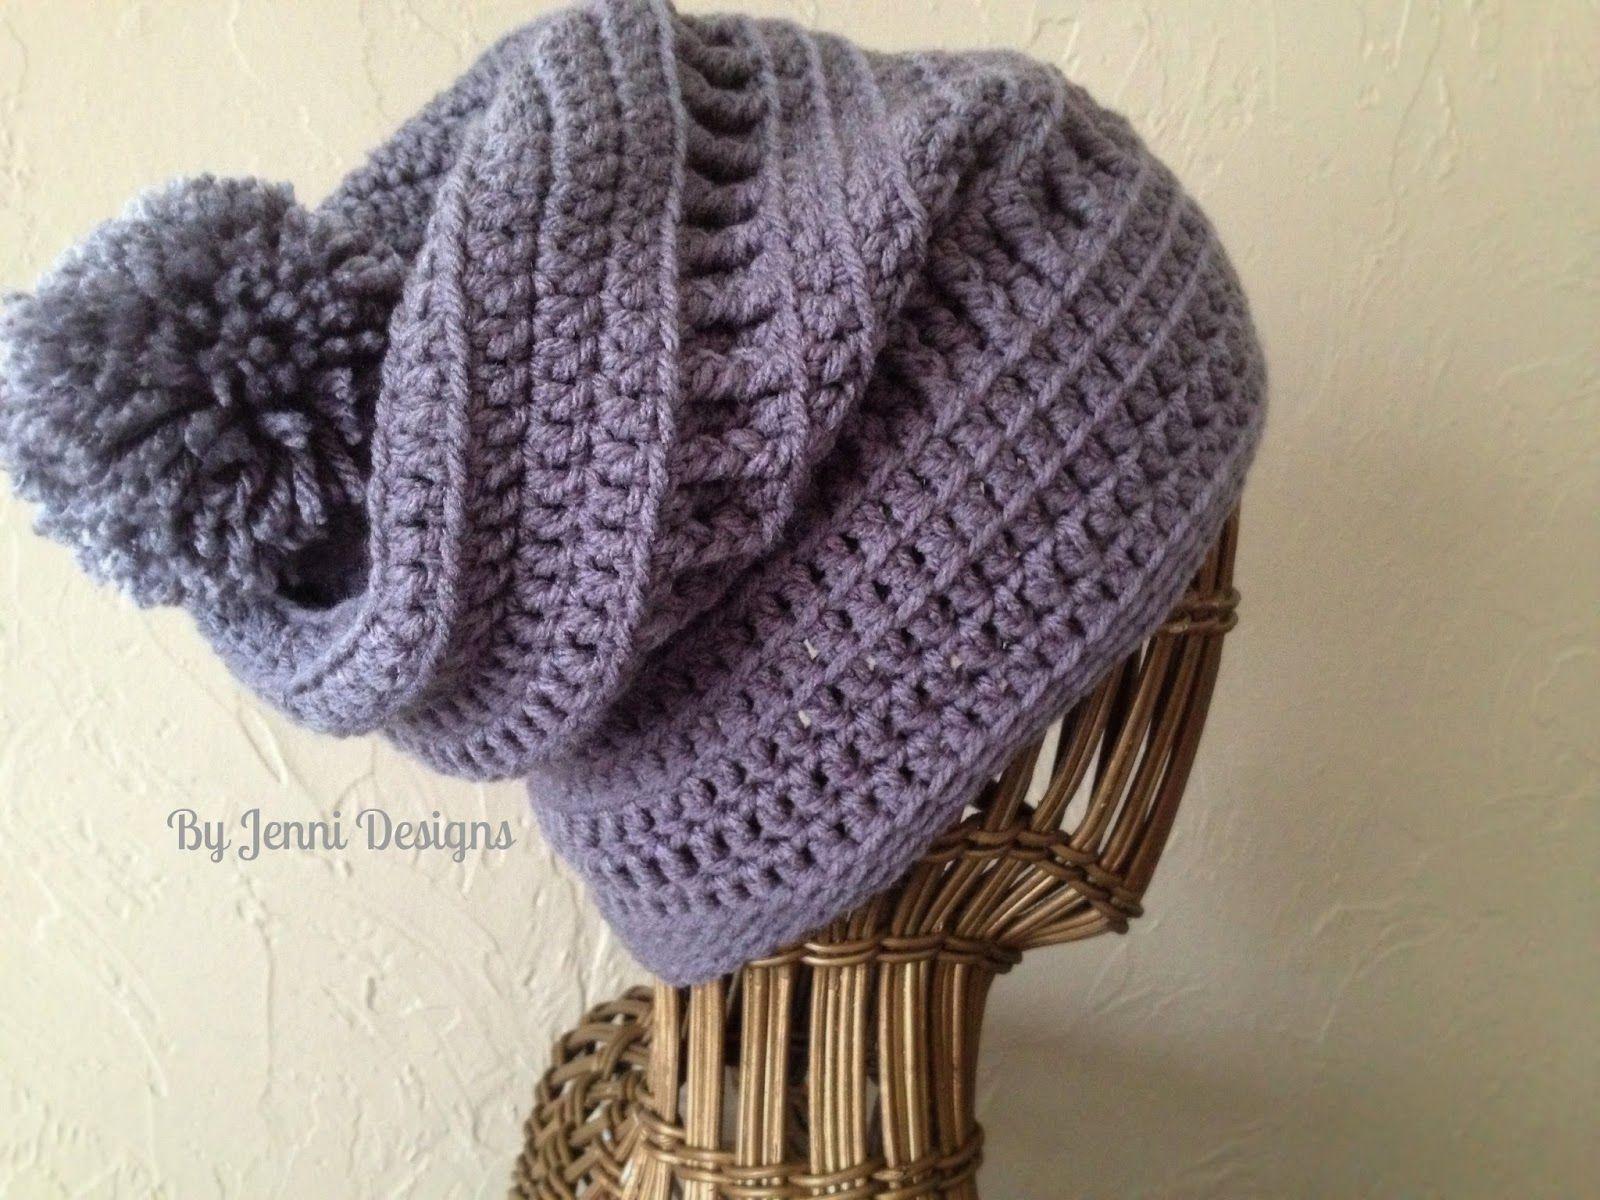 Crochet Hat Patterns Slouchy Textured Beanie Pattern Jenni Catavu Crafts Crochet